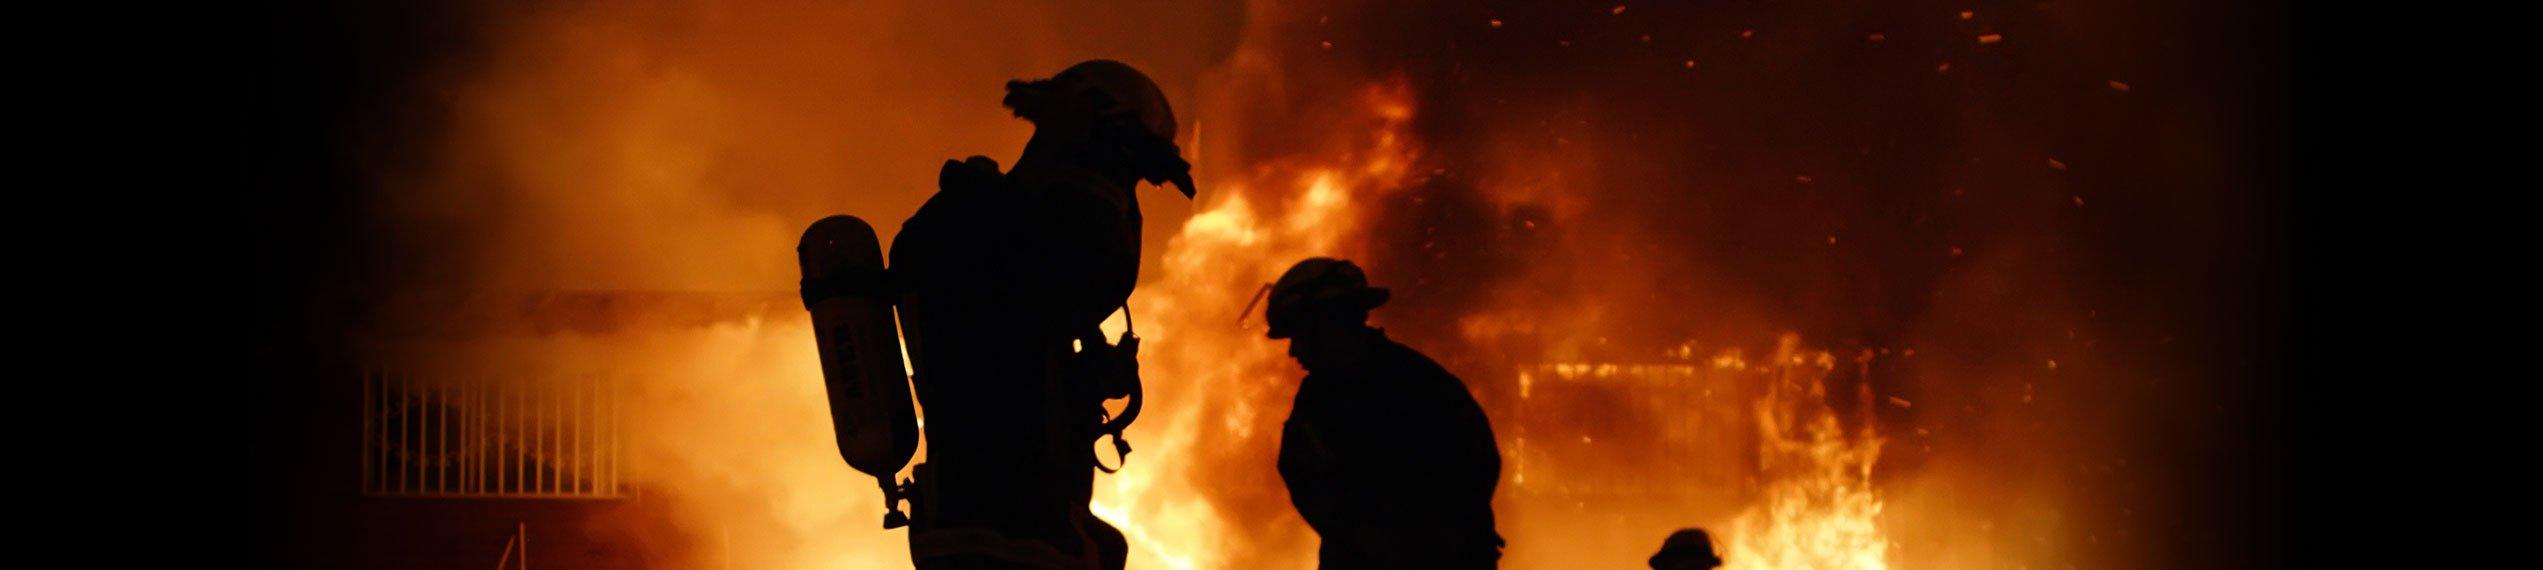 Fire & Smoke Damage Removal in Paul Davis Emergency Services of Southwest Oklahoma City, OK